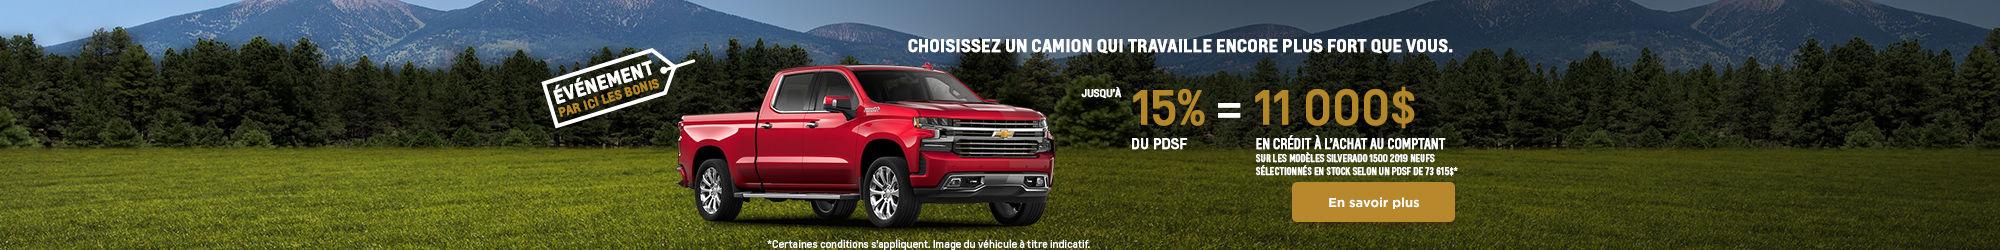 Événement Chevrolet!